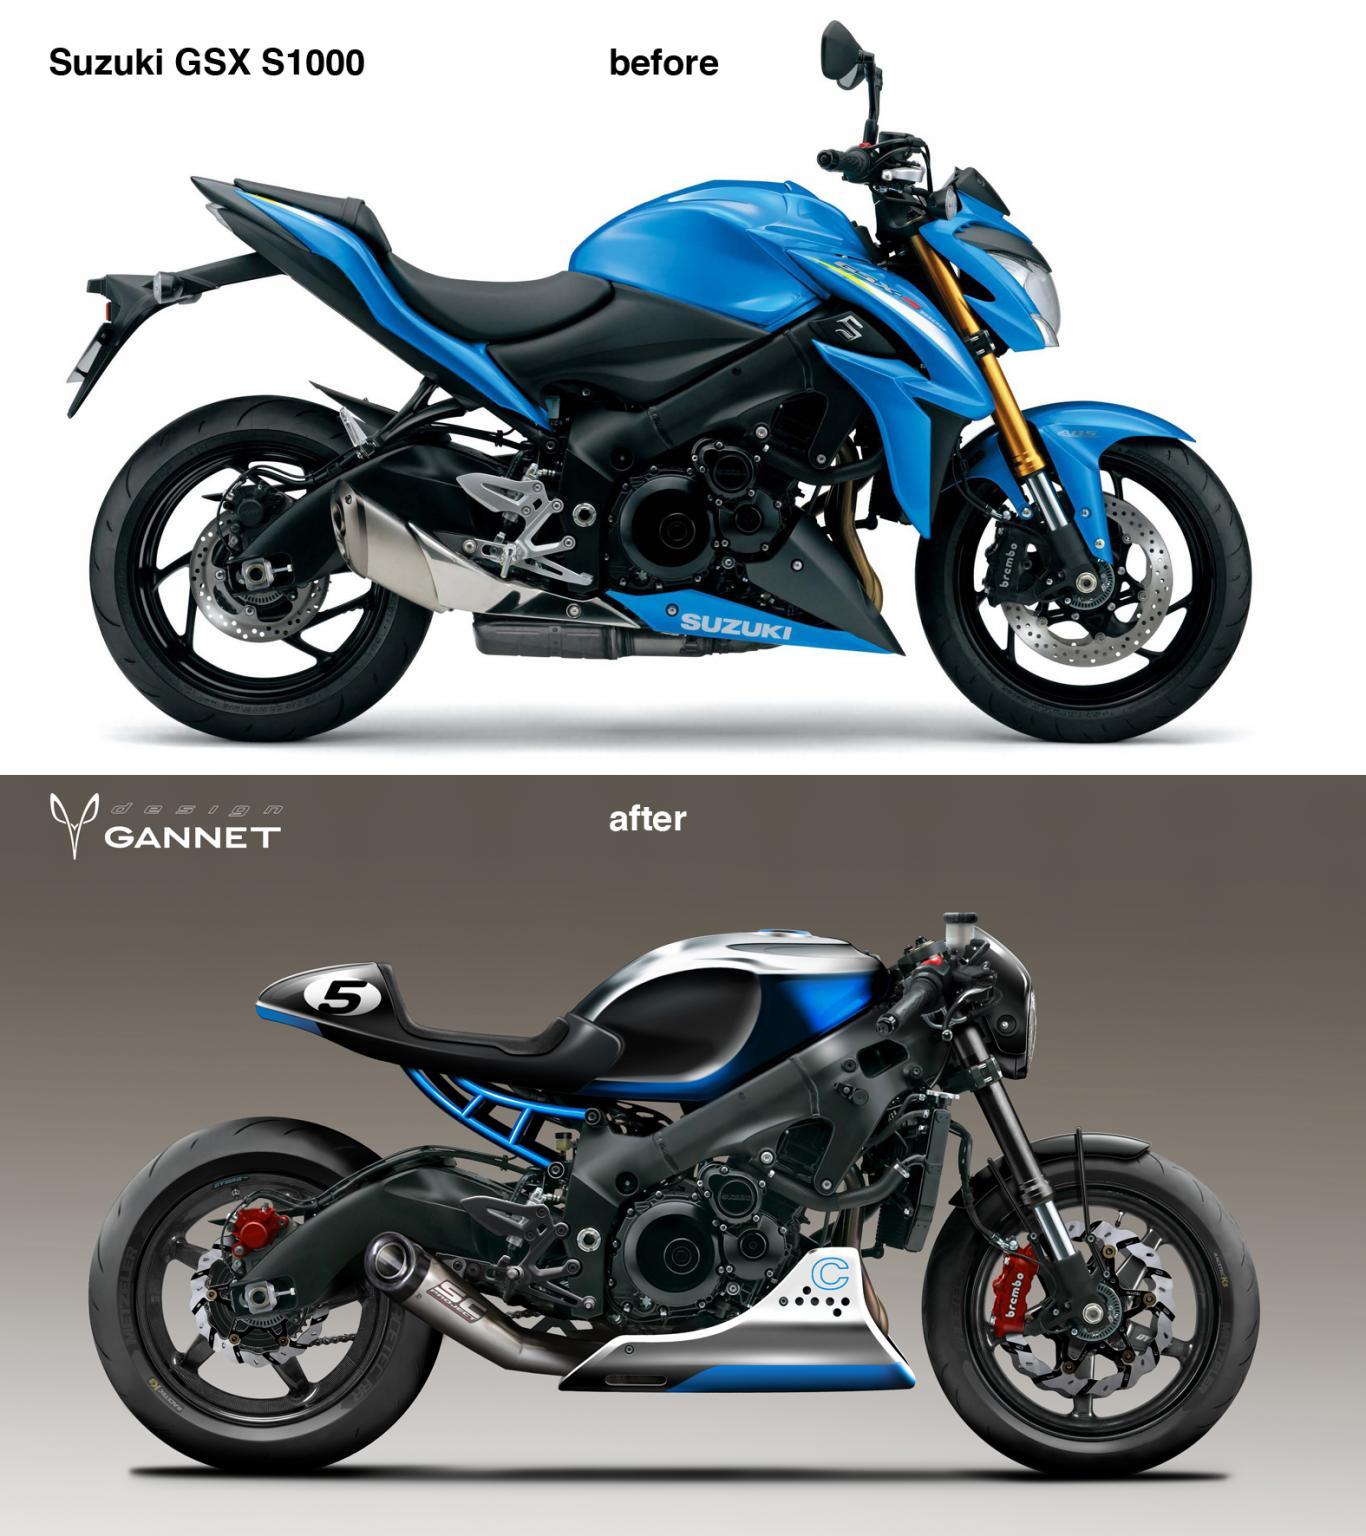 suzuki gsx s750 cafe racer motorrad fotos motorrad bilder. Black Bedroom Furniture Sets. Home Design Ideas